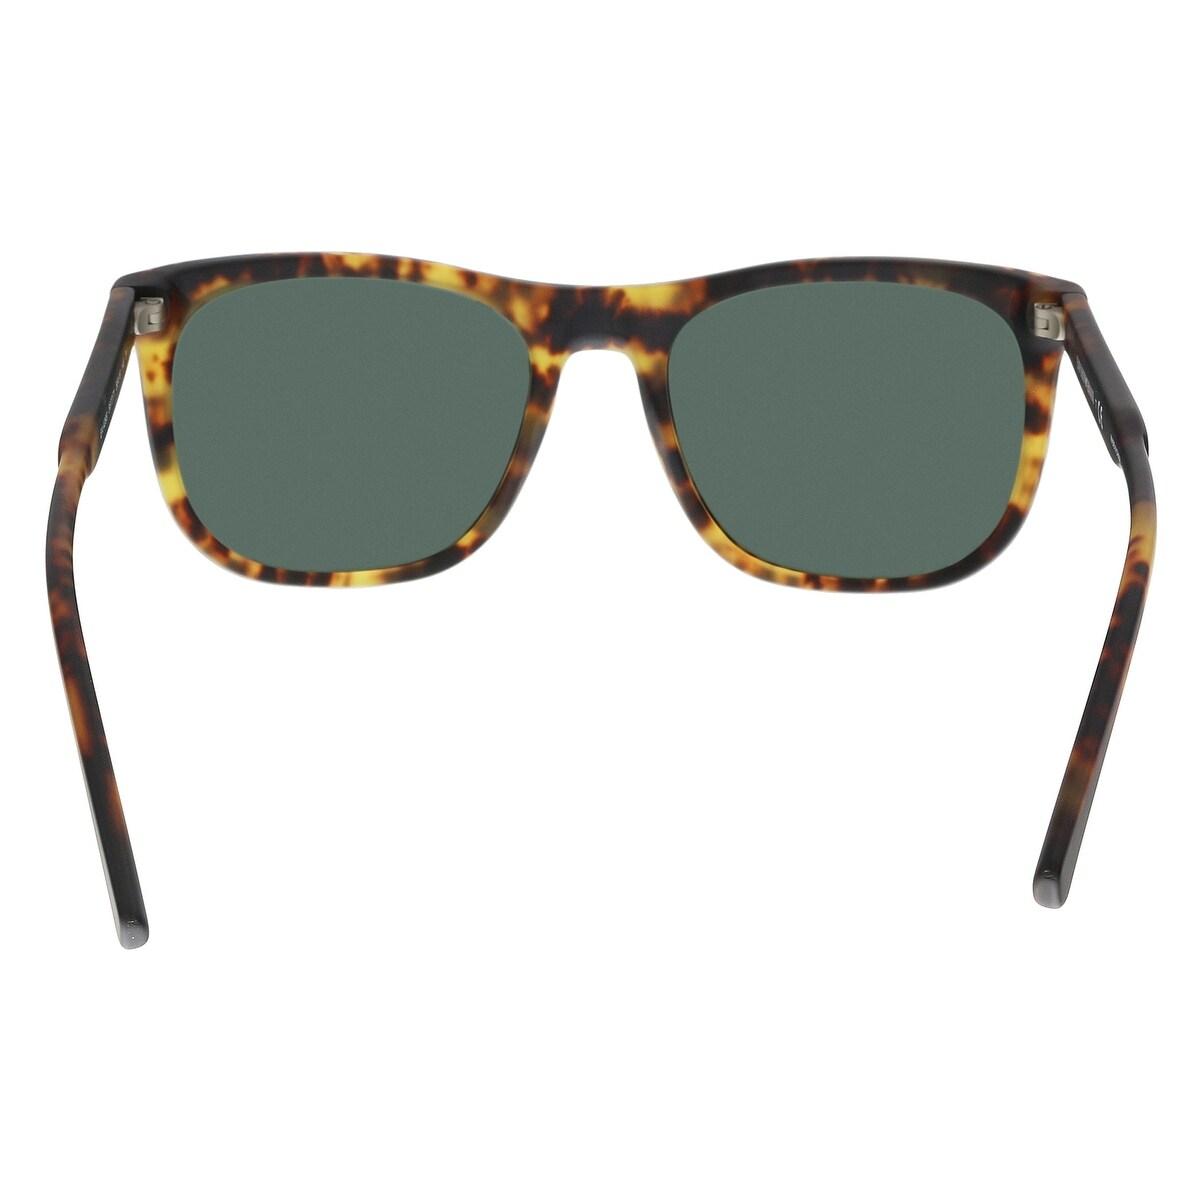 Emporio Armani EA4099 567771 Matte Blonde Havana Rectangle Sunglasses -  56-19-145 - Free Shipping Today - Overstock - 27088617 0ae6b8a0aa